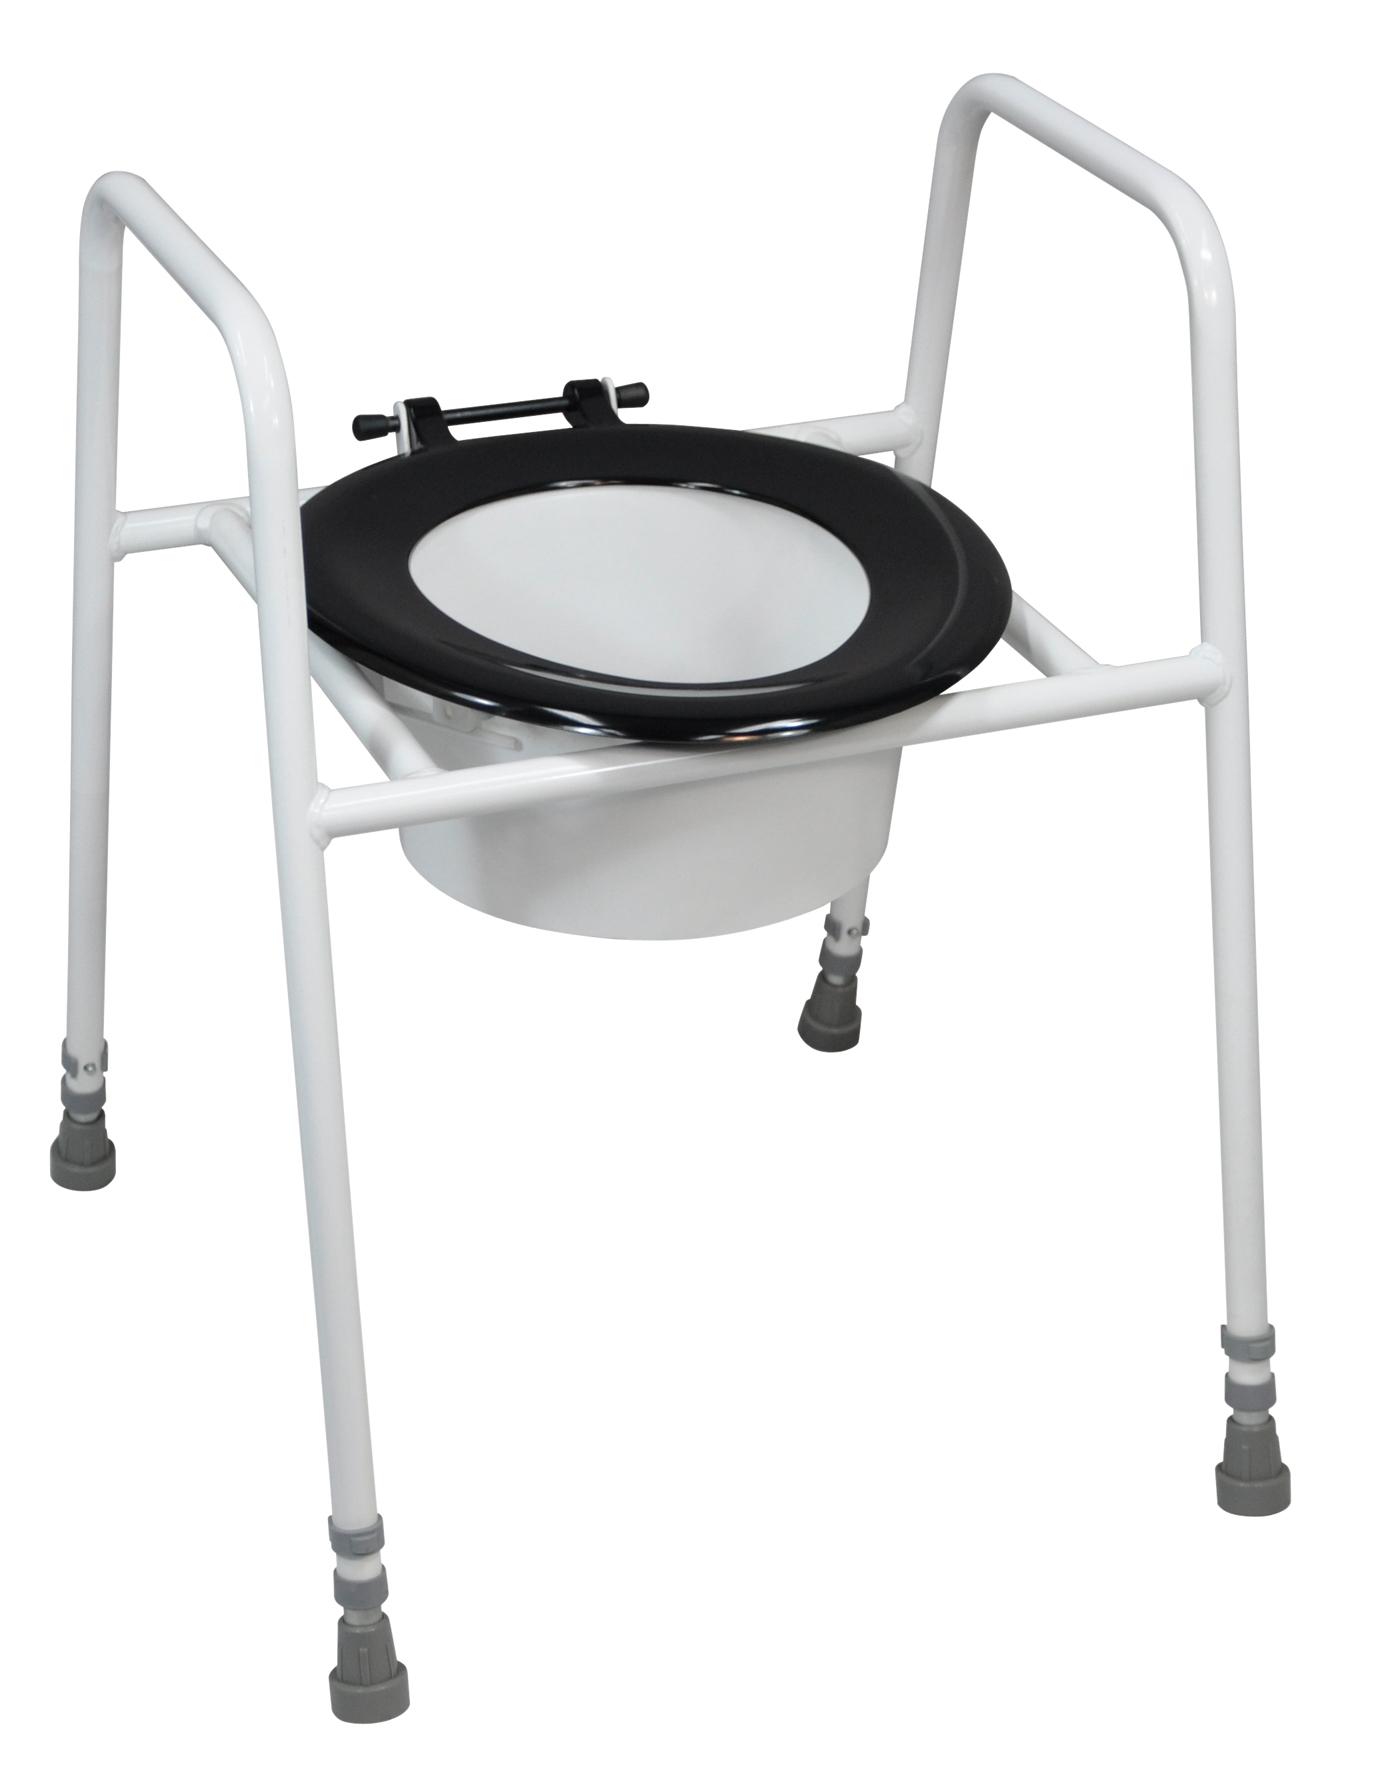 toileting ezkom_solo-skandia-raised-toilet-seat-and-frame-vr157-1.jpg